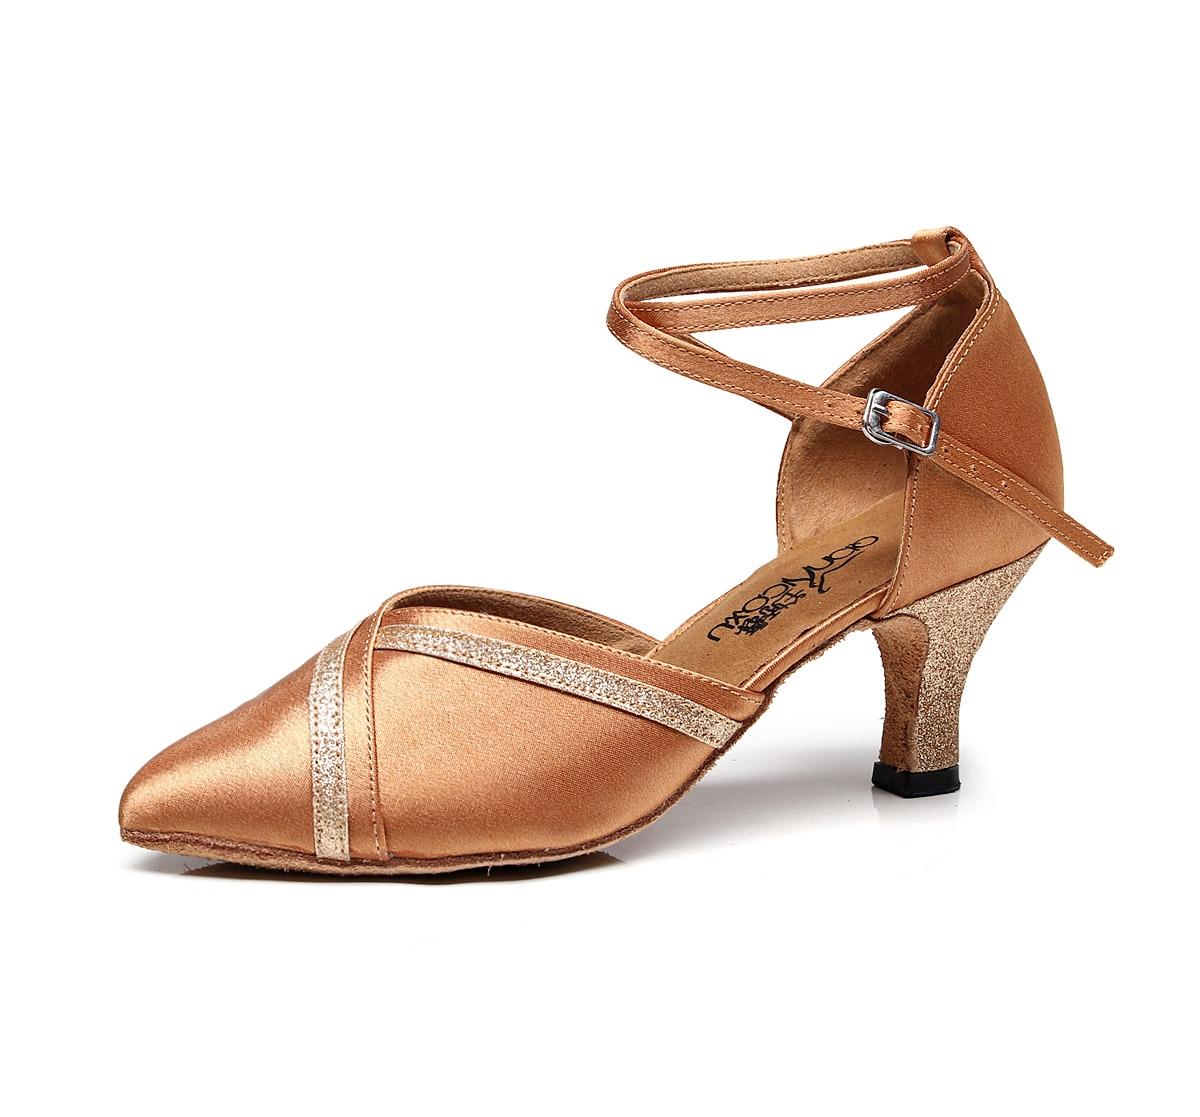 2020 Coupon Hot Salsa Jazz Ballroom Latin Dance Shoes For Dancing Women Chinese Waltz With Heels Pumps 6133 Schoenen Beige Pumps